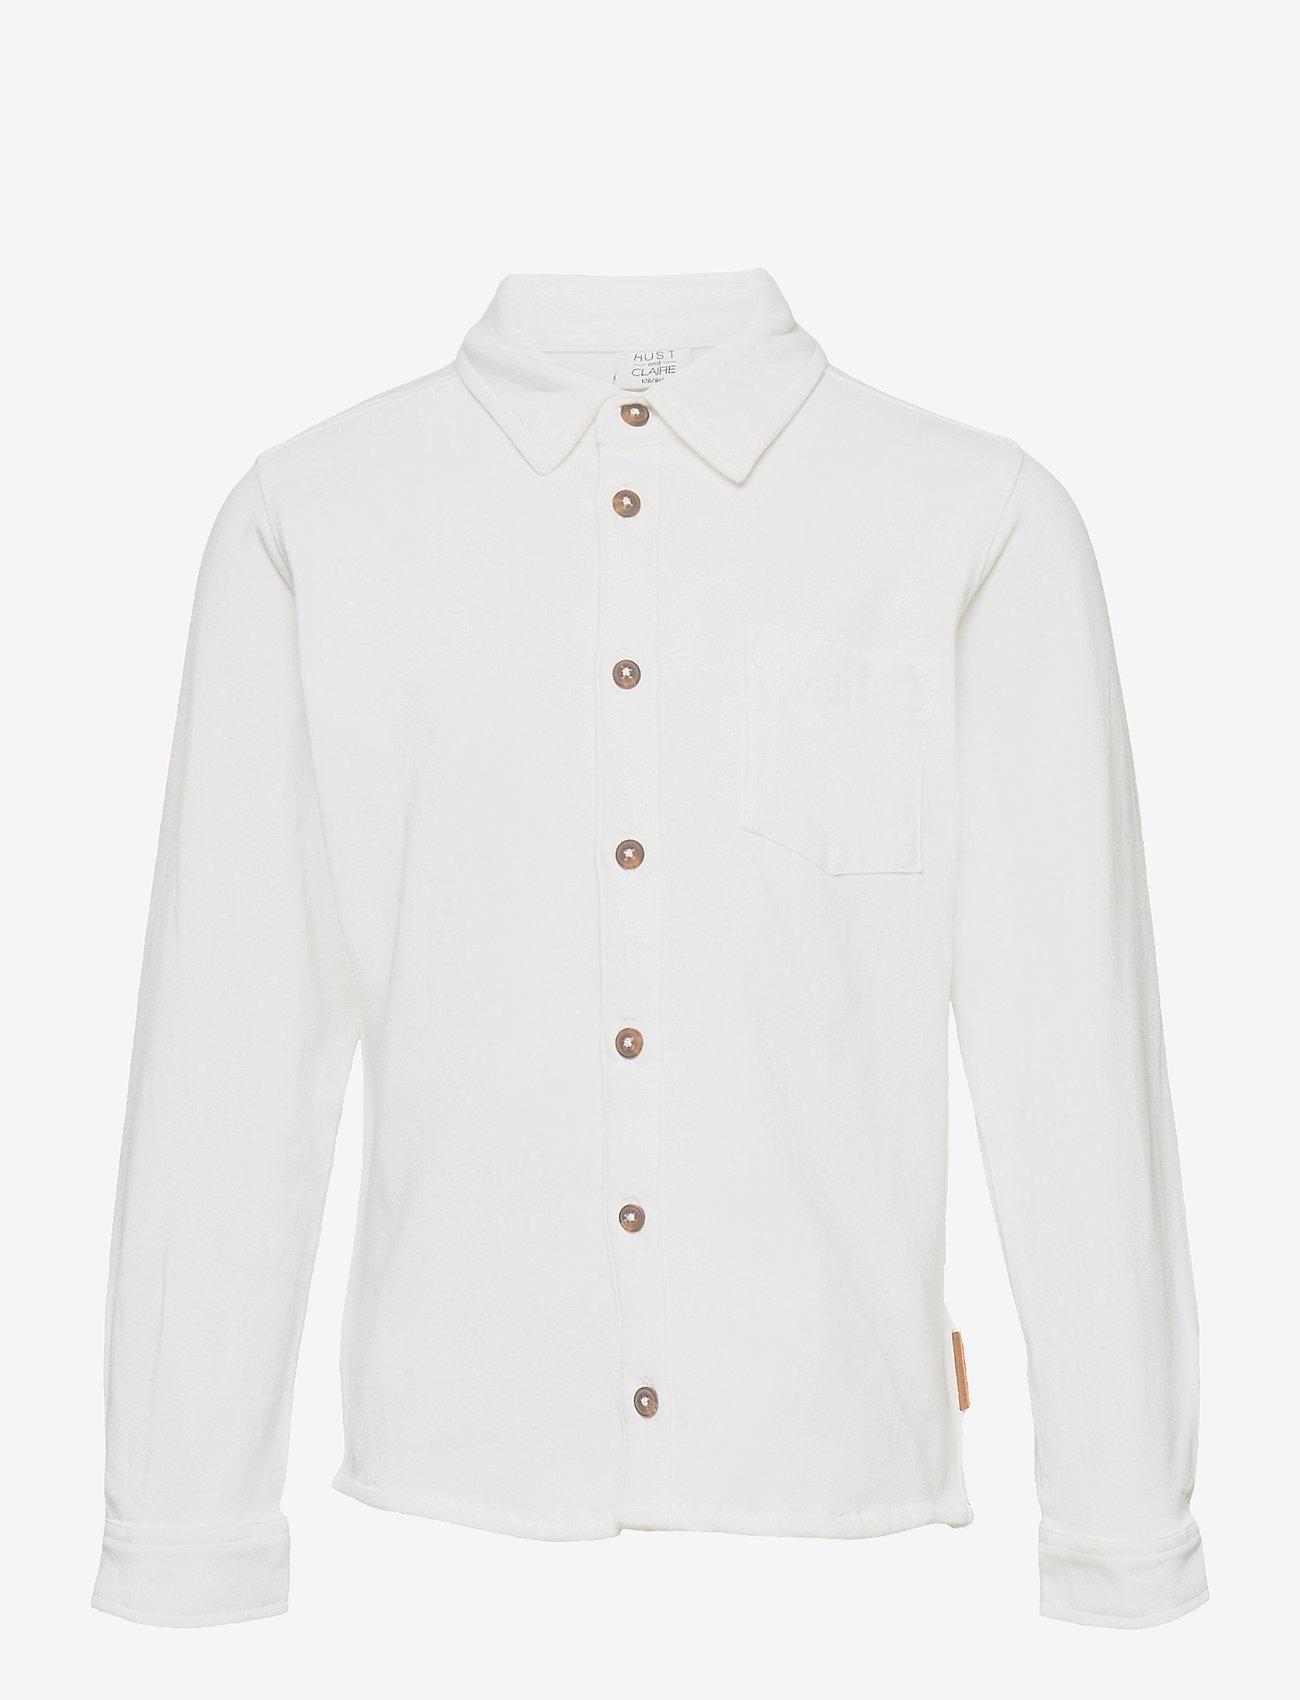 Hust & Claire - Rasmus - Shirt - shirts - white - 0